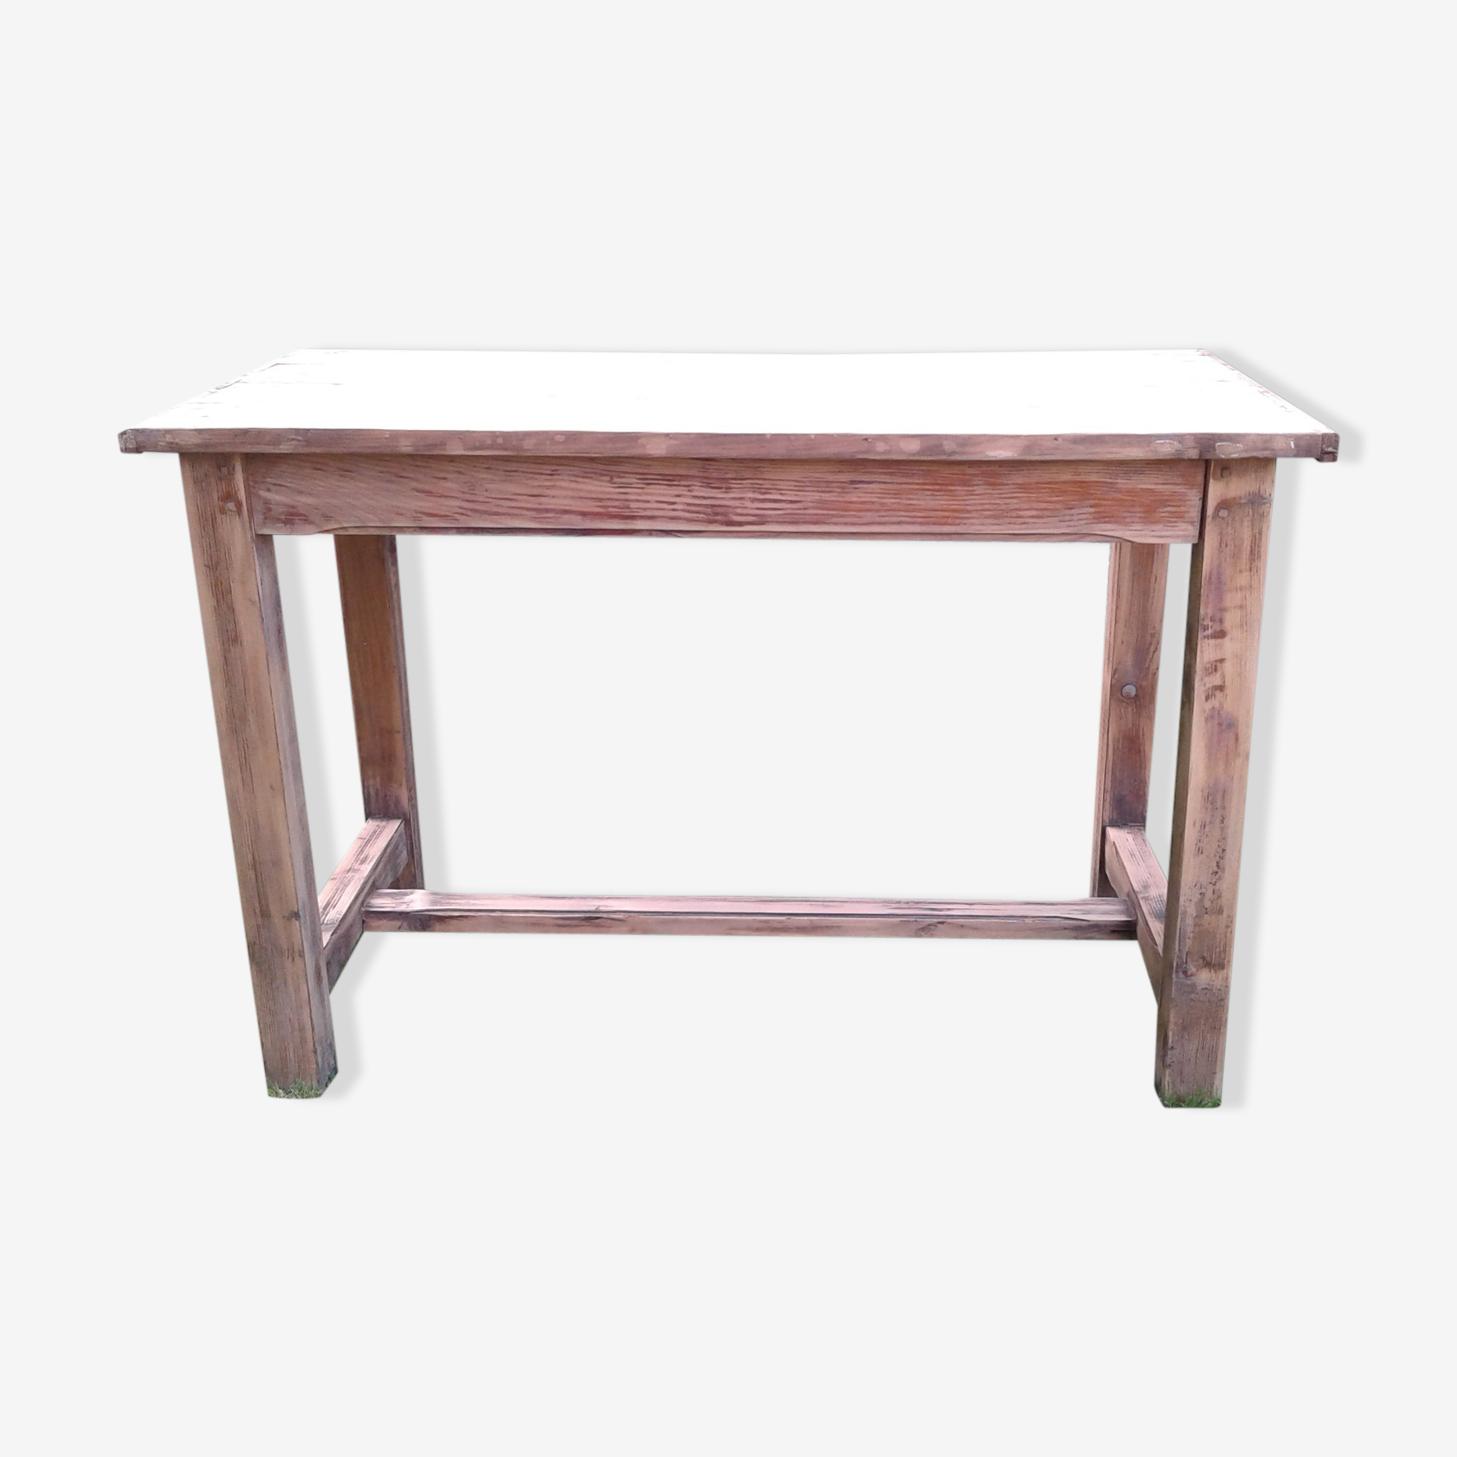 Table de ferme ancienne en sapin